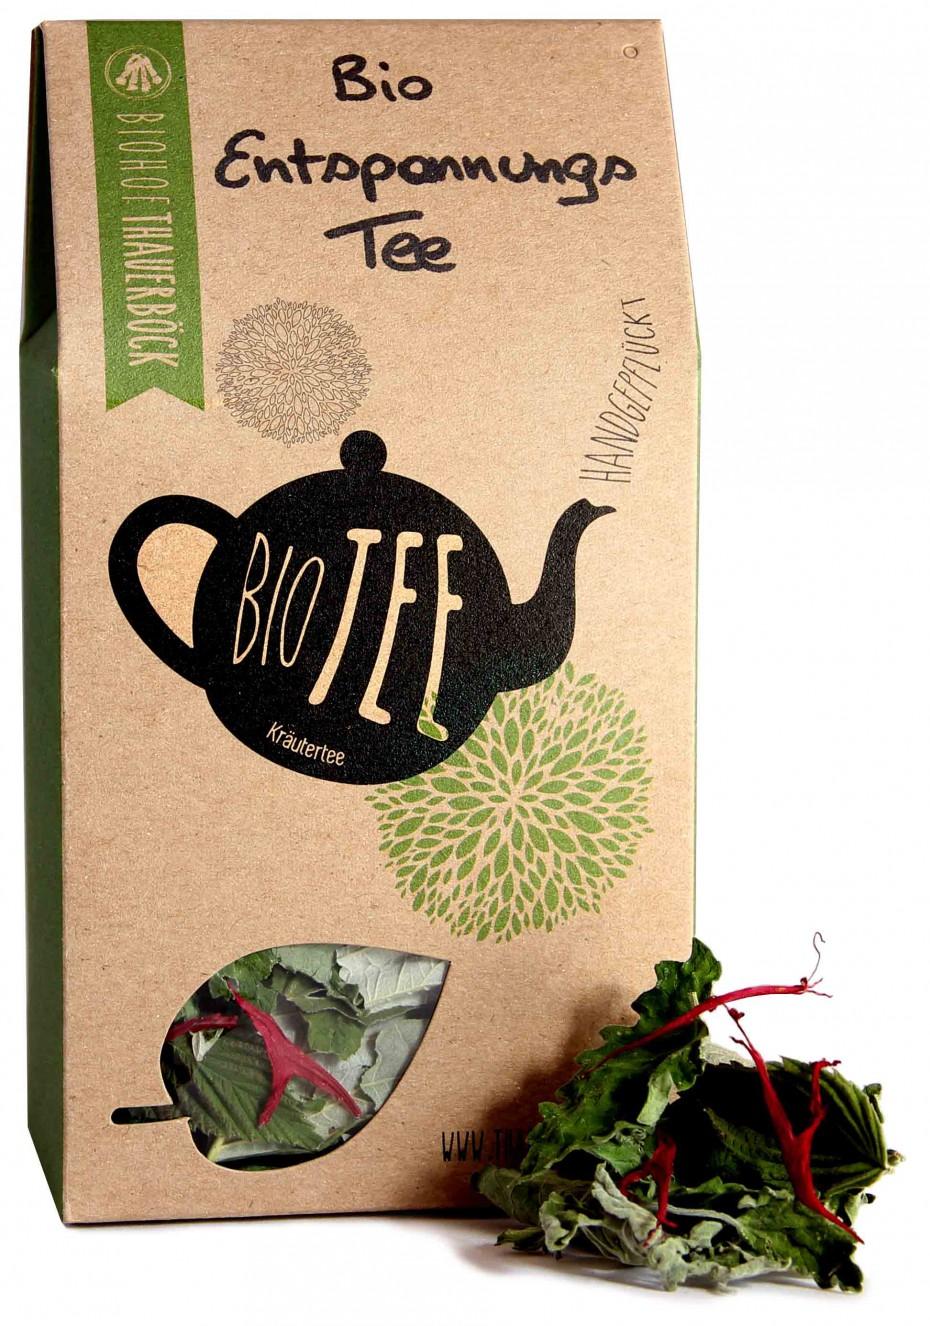 Bio Entspannungs Tee